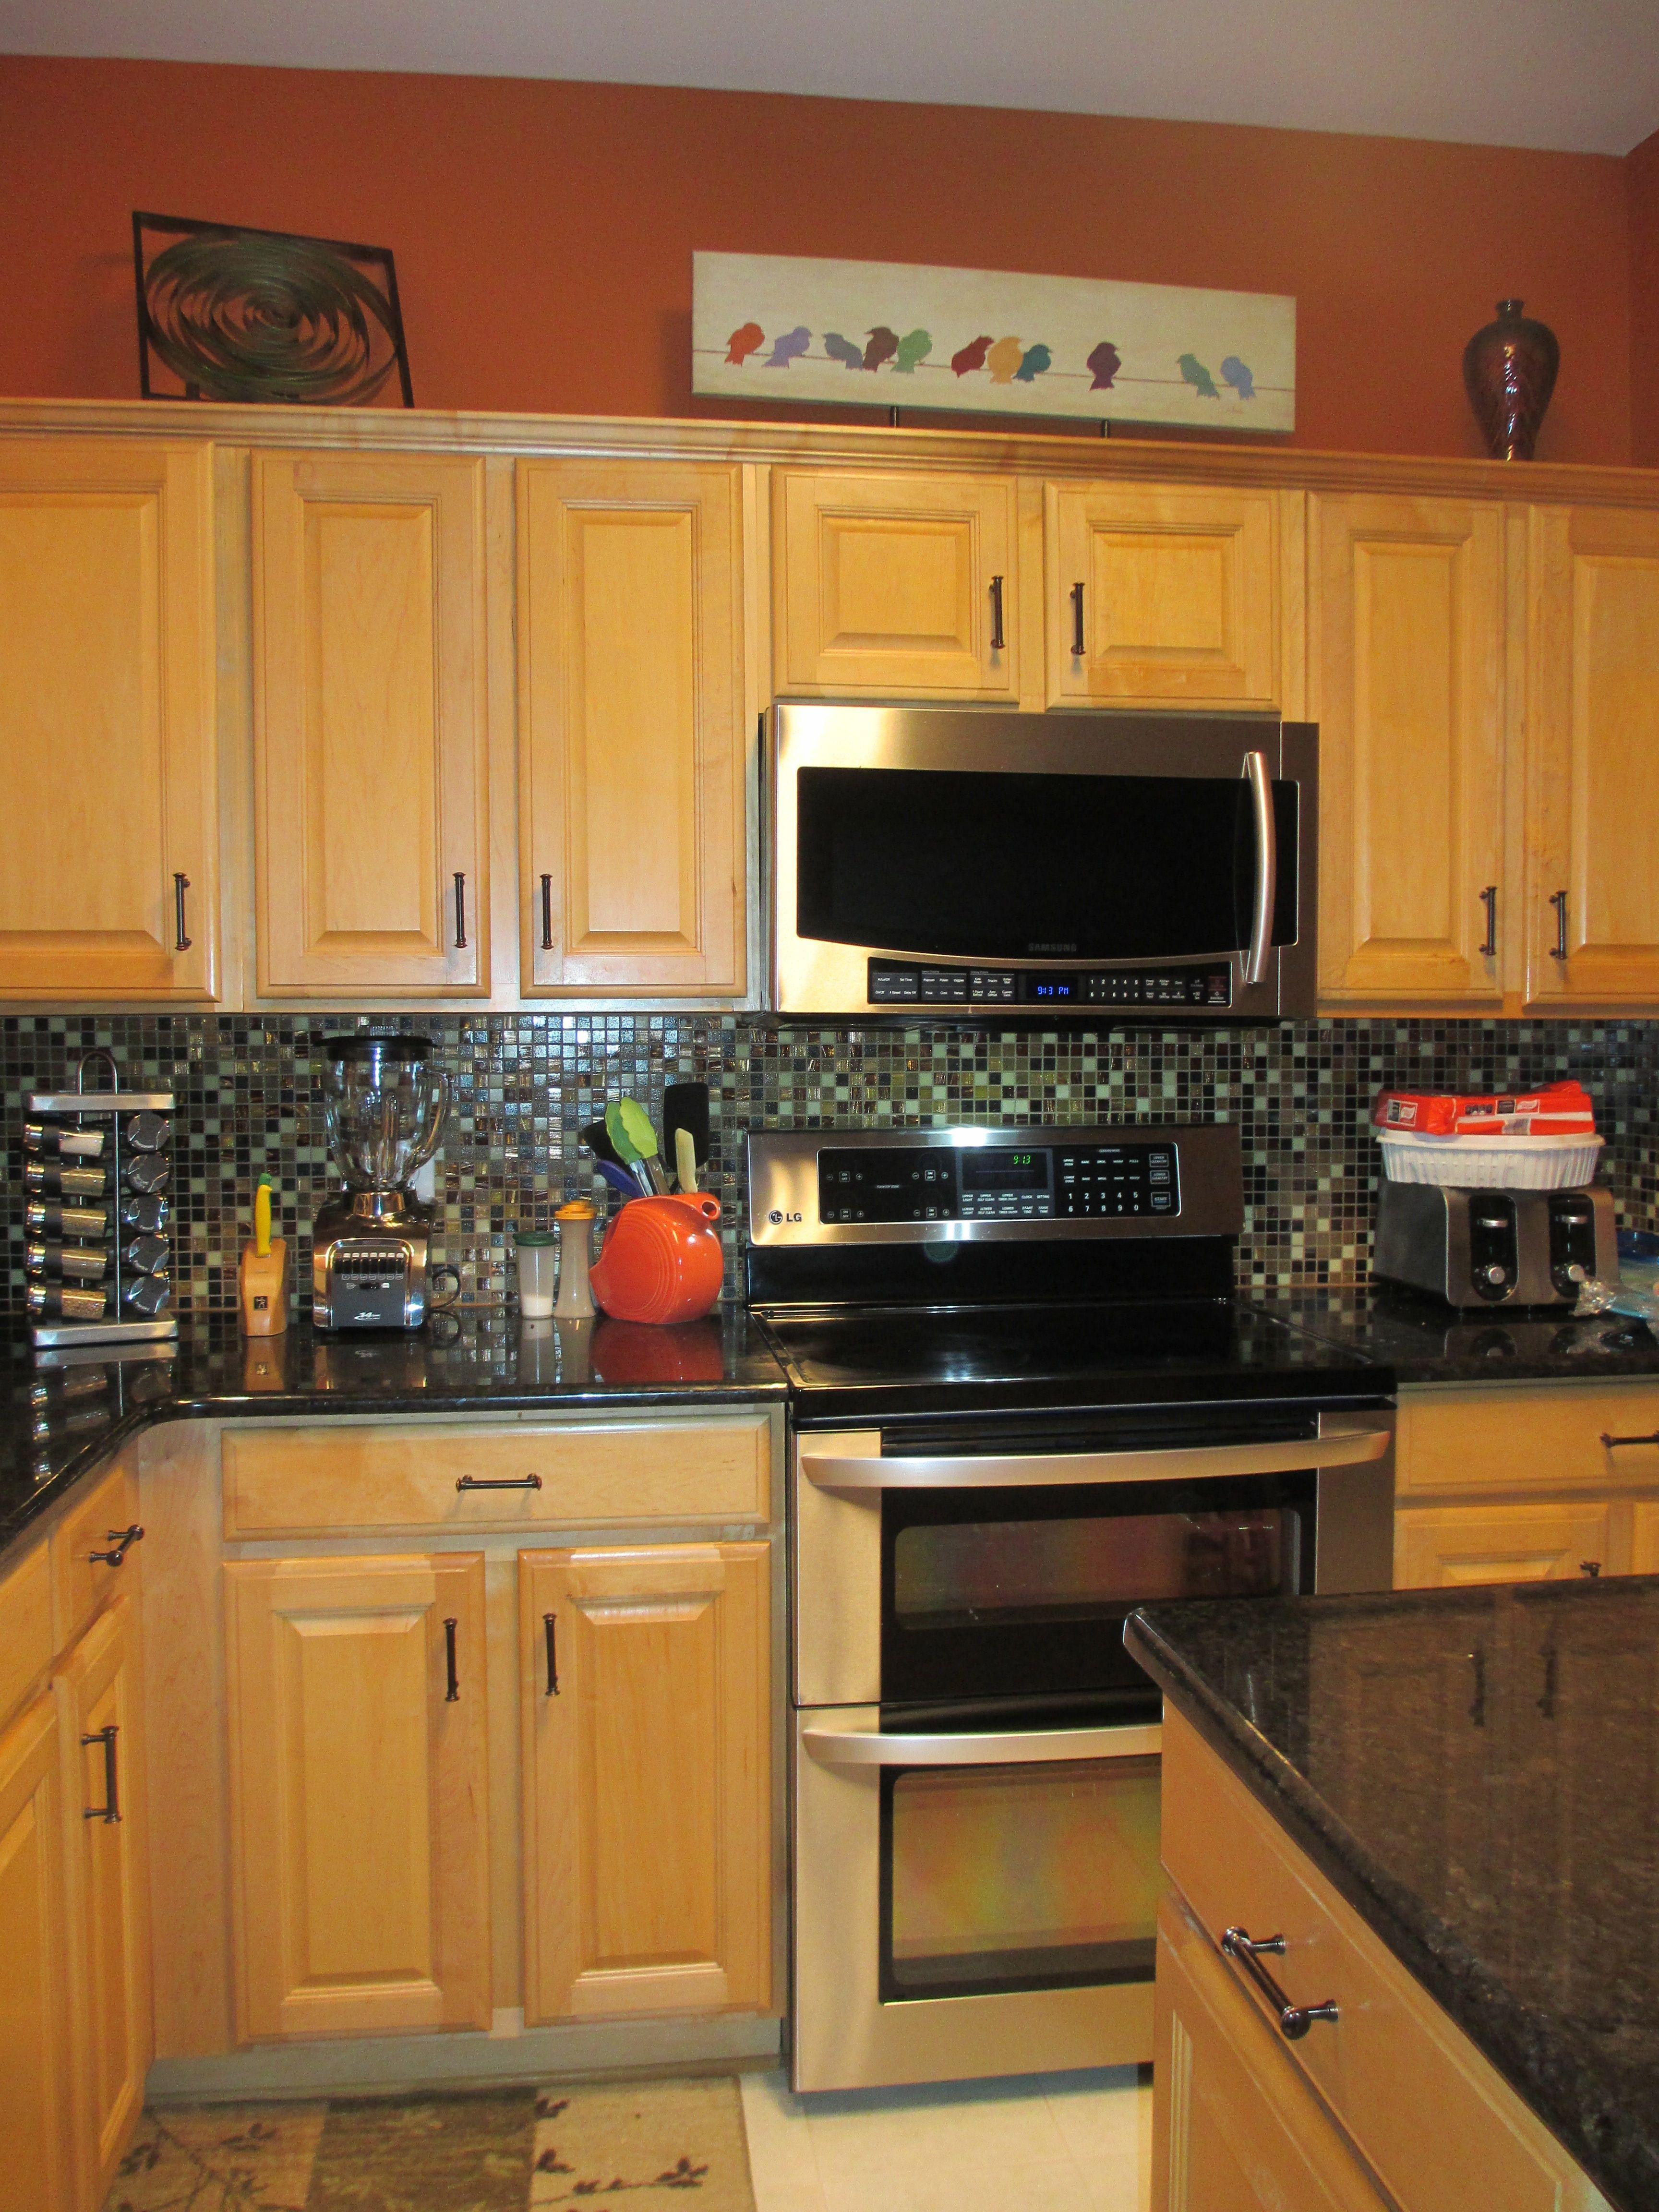 Burnt Orange Kitchen With Black Pearl Granite Countertops Orange Kitchen Decor Orange Kitchen Walls Burnt Orange Kitchen Orange countertops in kitchen